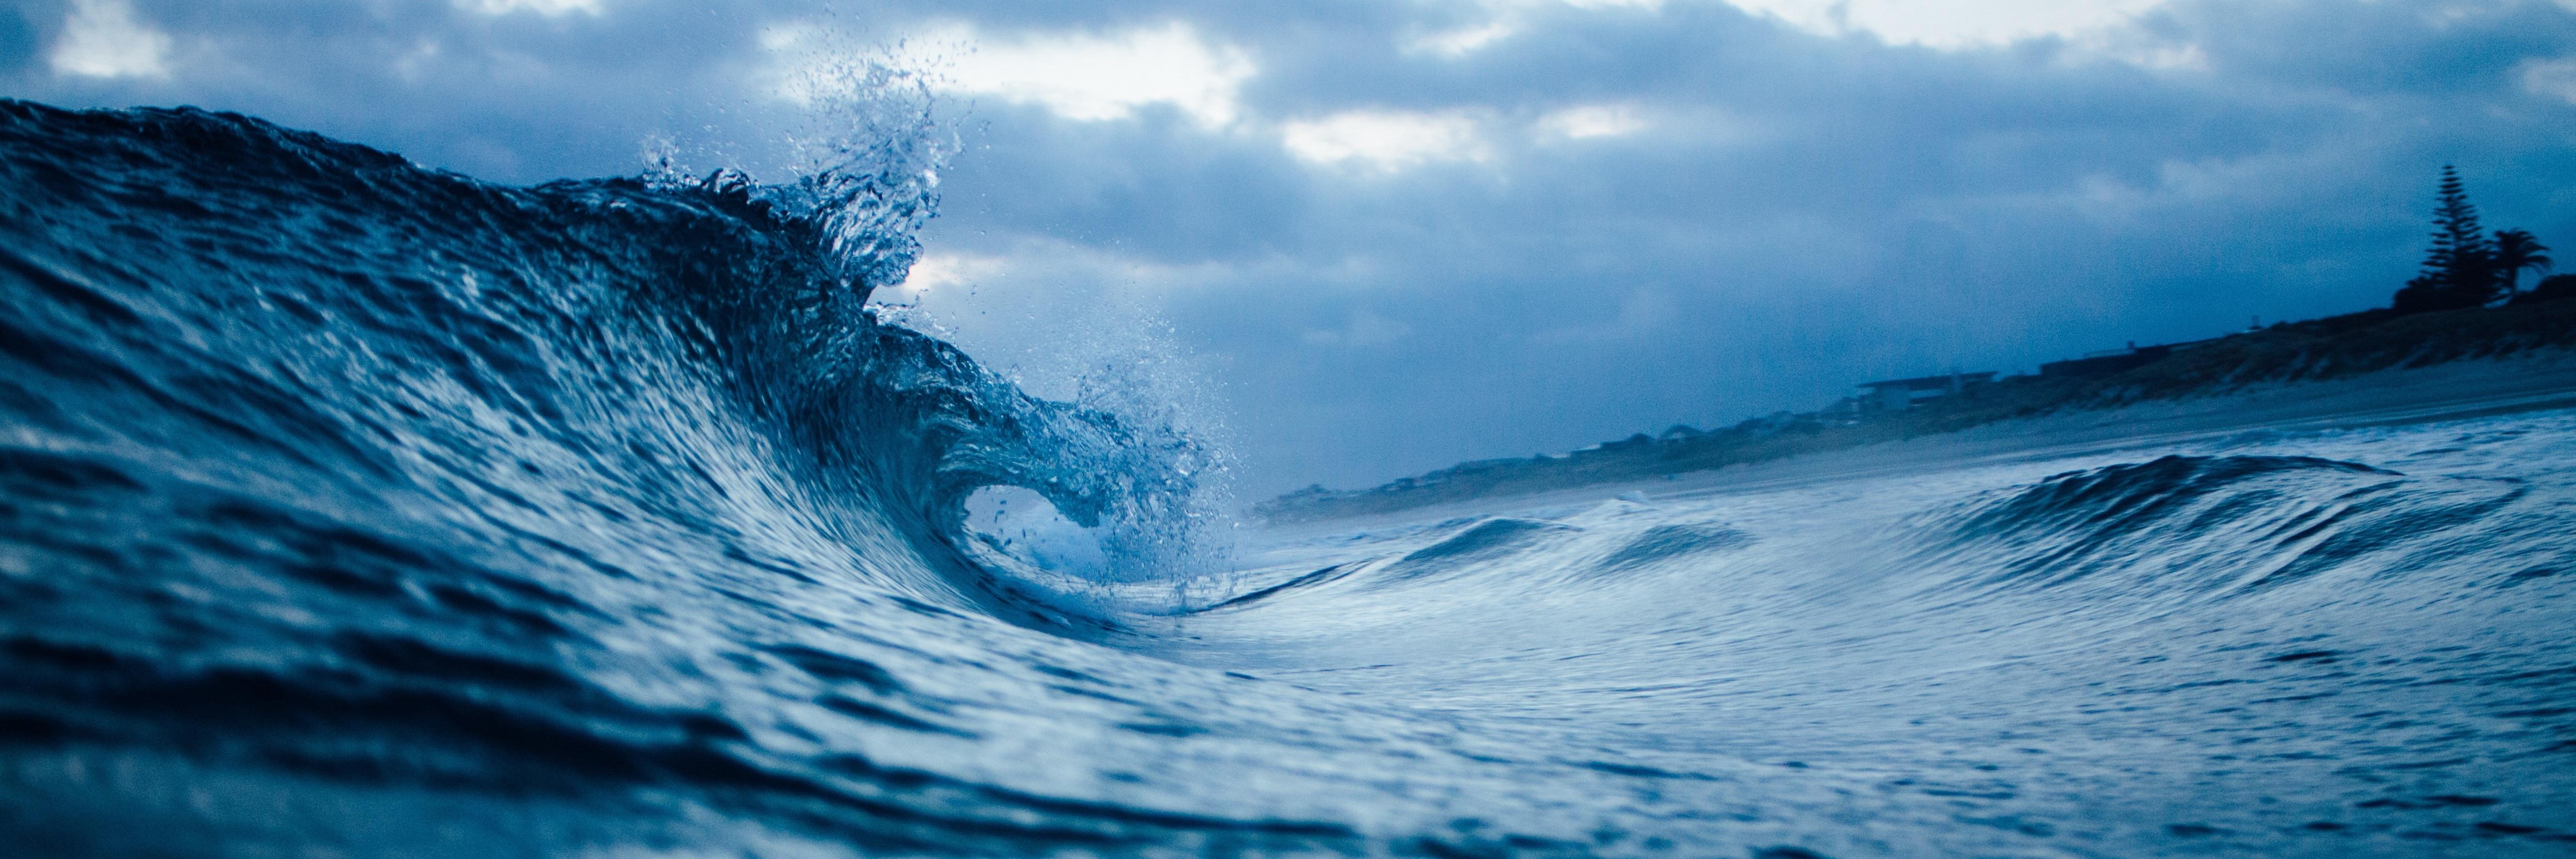 ocean wave on dark day heading towards shore